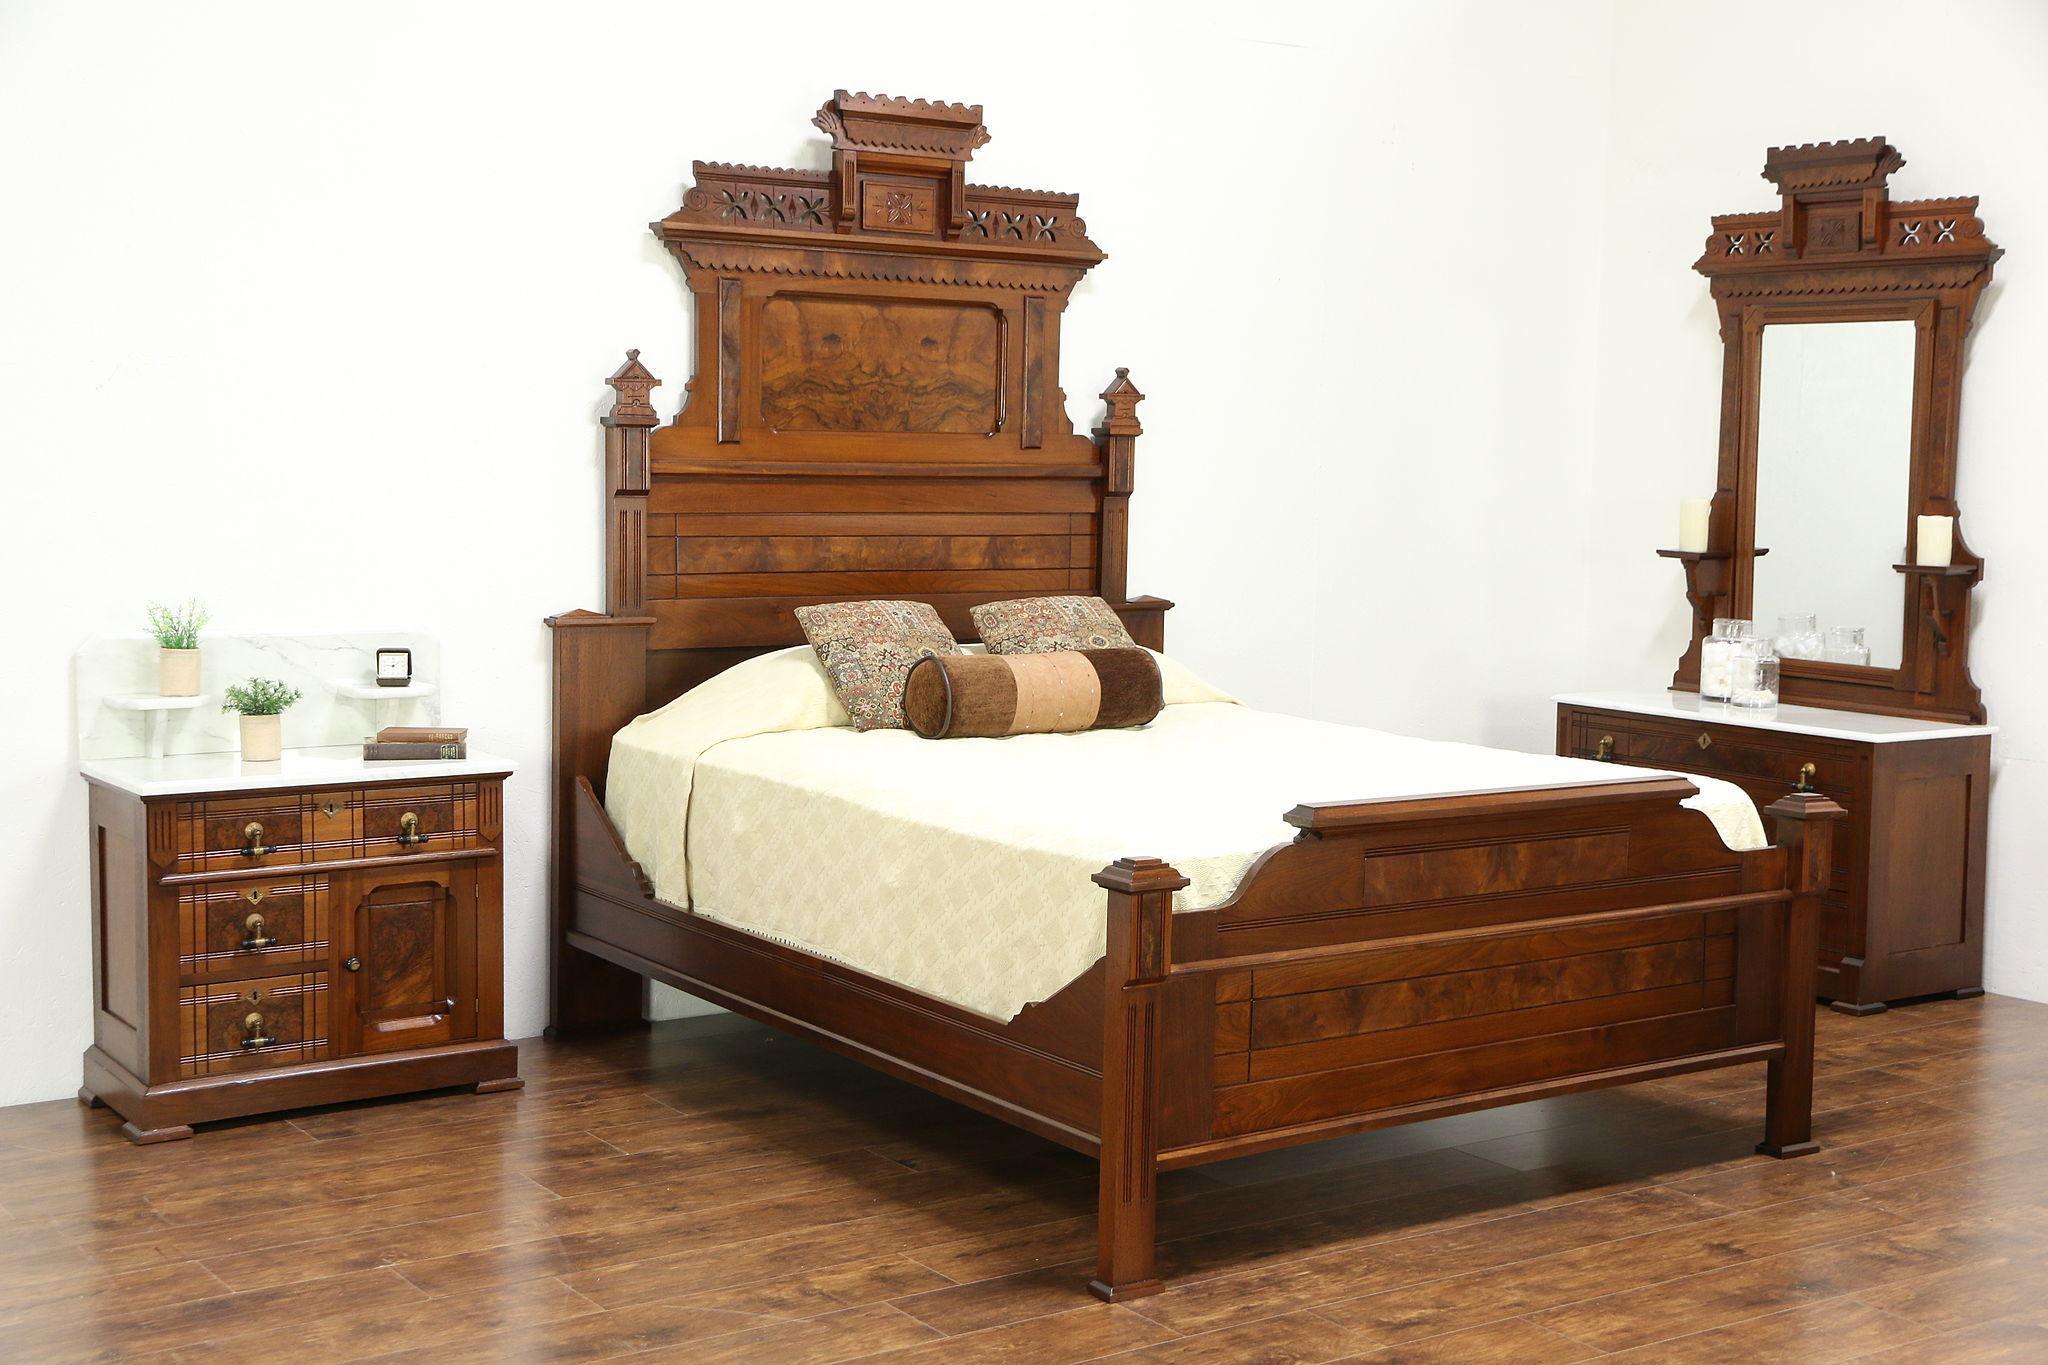 Sold Victorian Eastlake Antique 1875 Walnut Queen Size 3 Pc